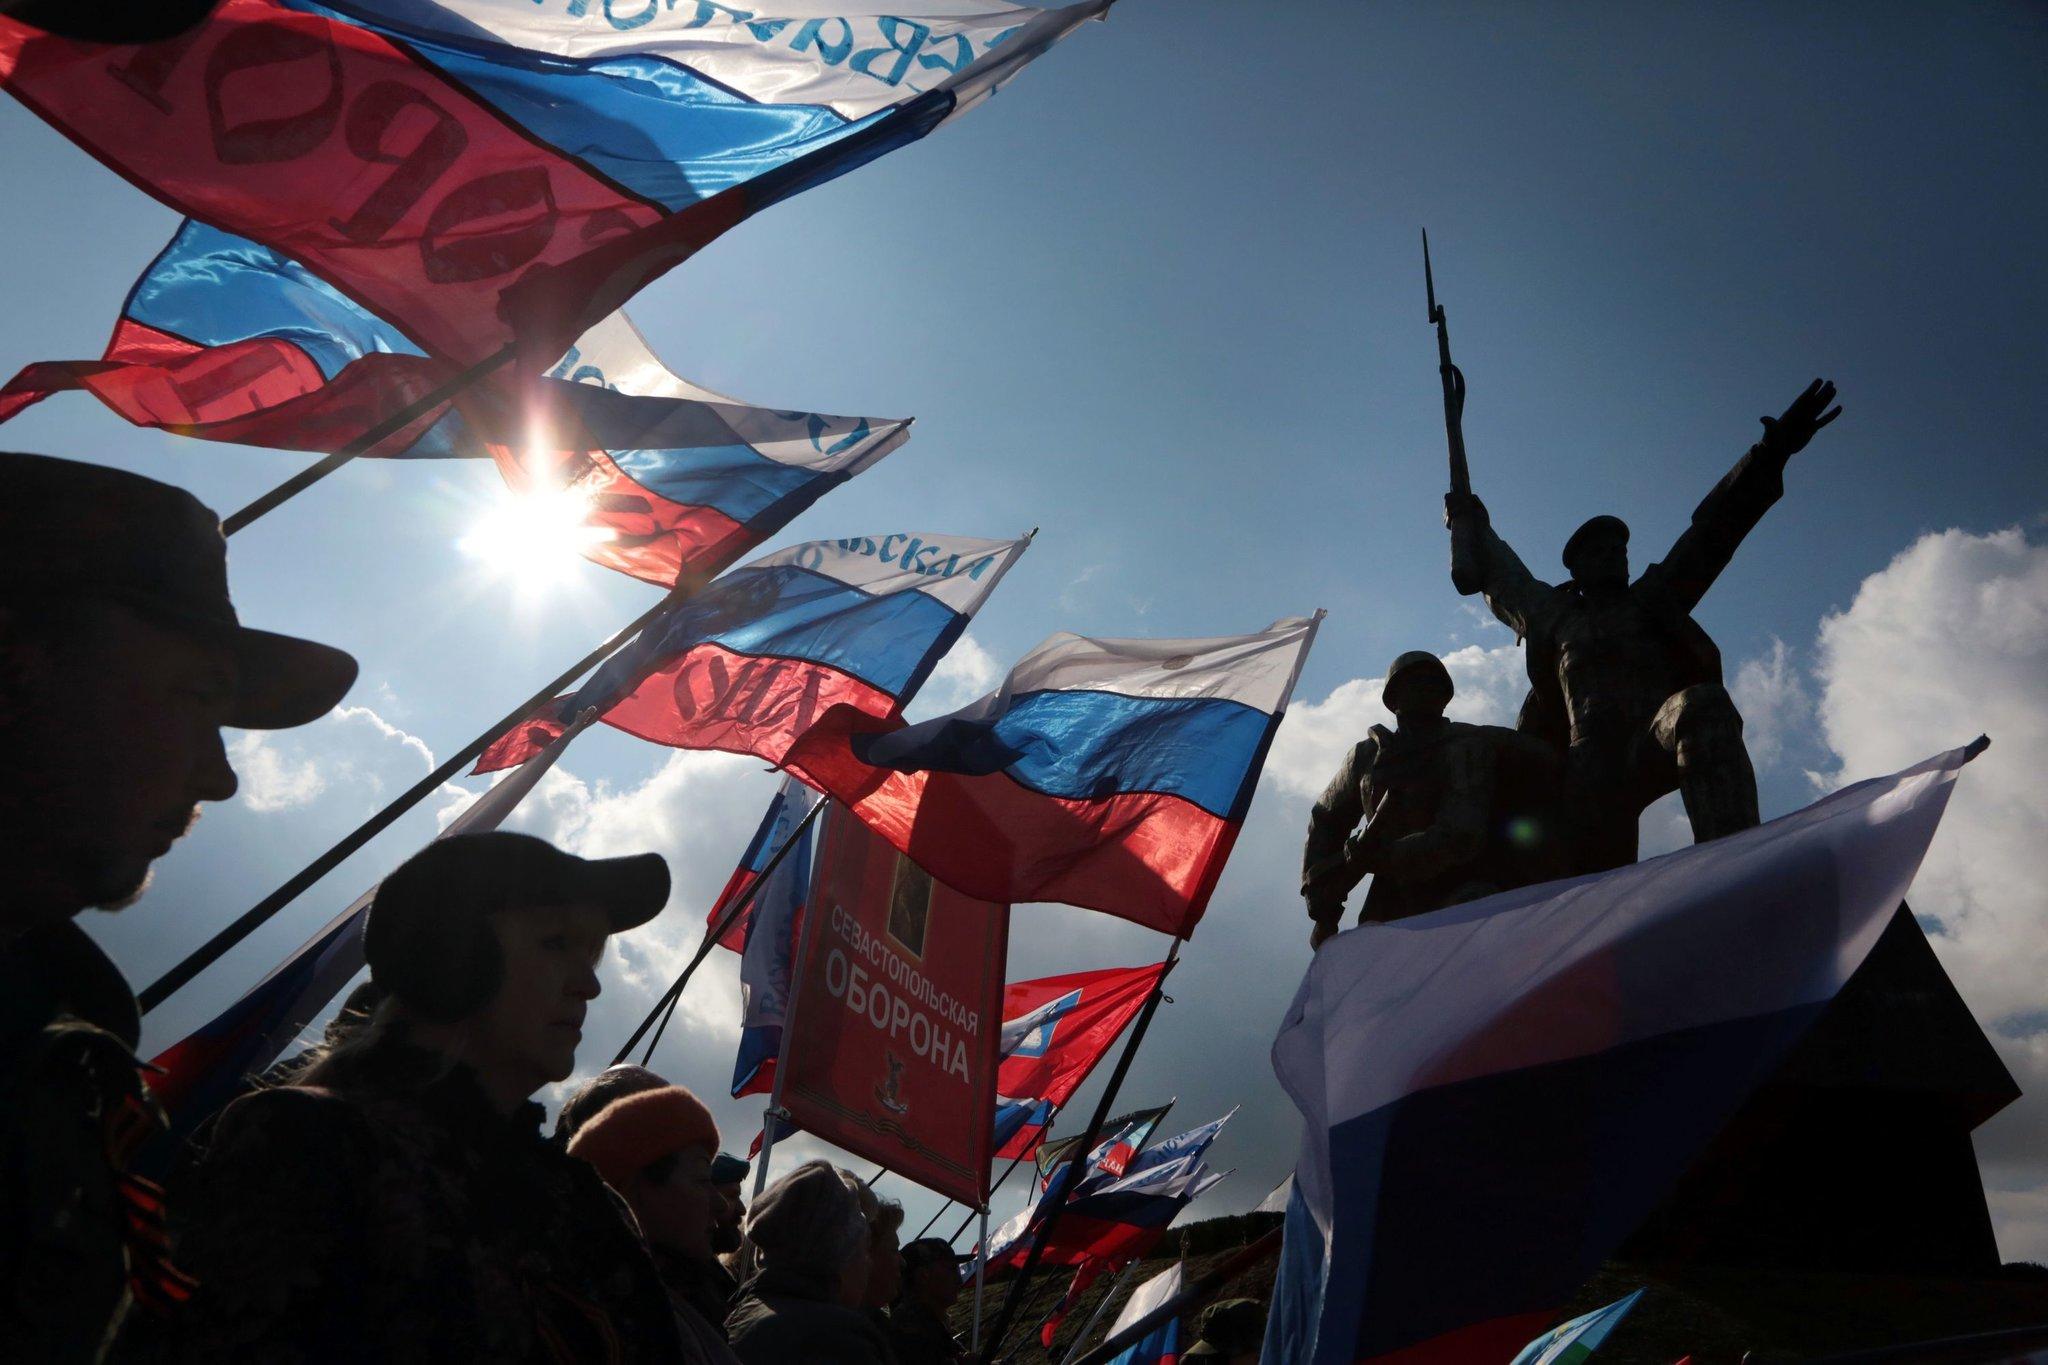 Građani Sevastopolja na Krimu mašu ruskim zastavama povodom treće godišnjice od pripajanja Krima Rusiji, mart 2017. (Foto: Max Vetrov/Agence France-Presse/Getty Images)